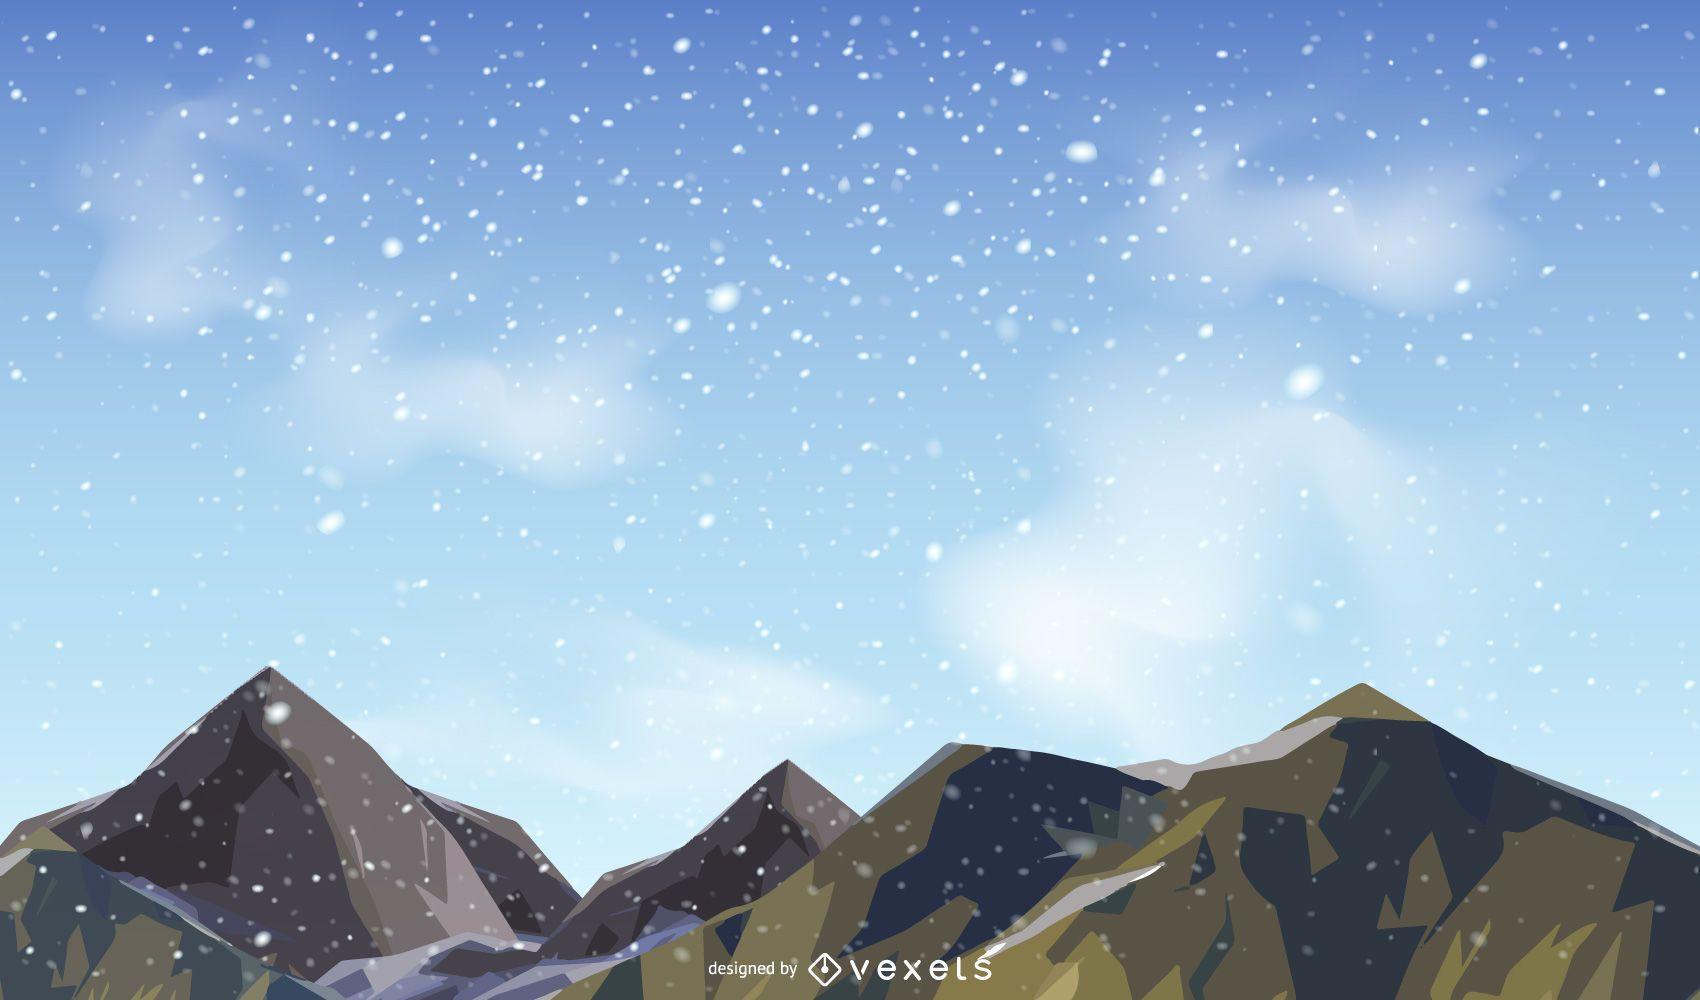 Diseño vectorial de montañas nevadas